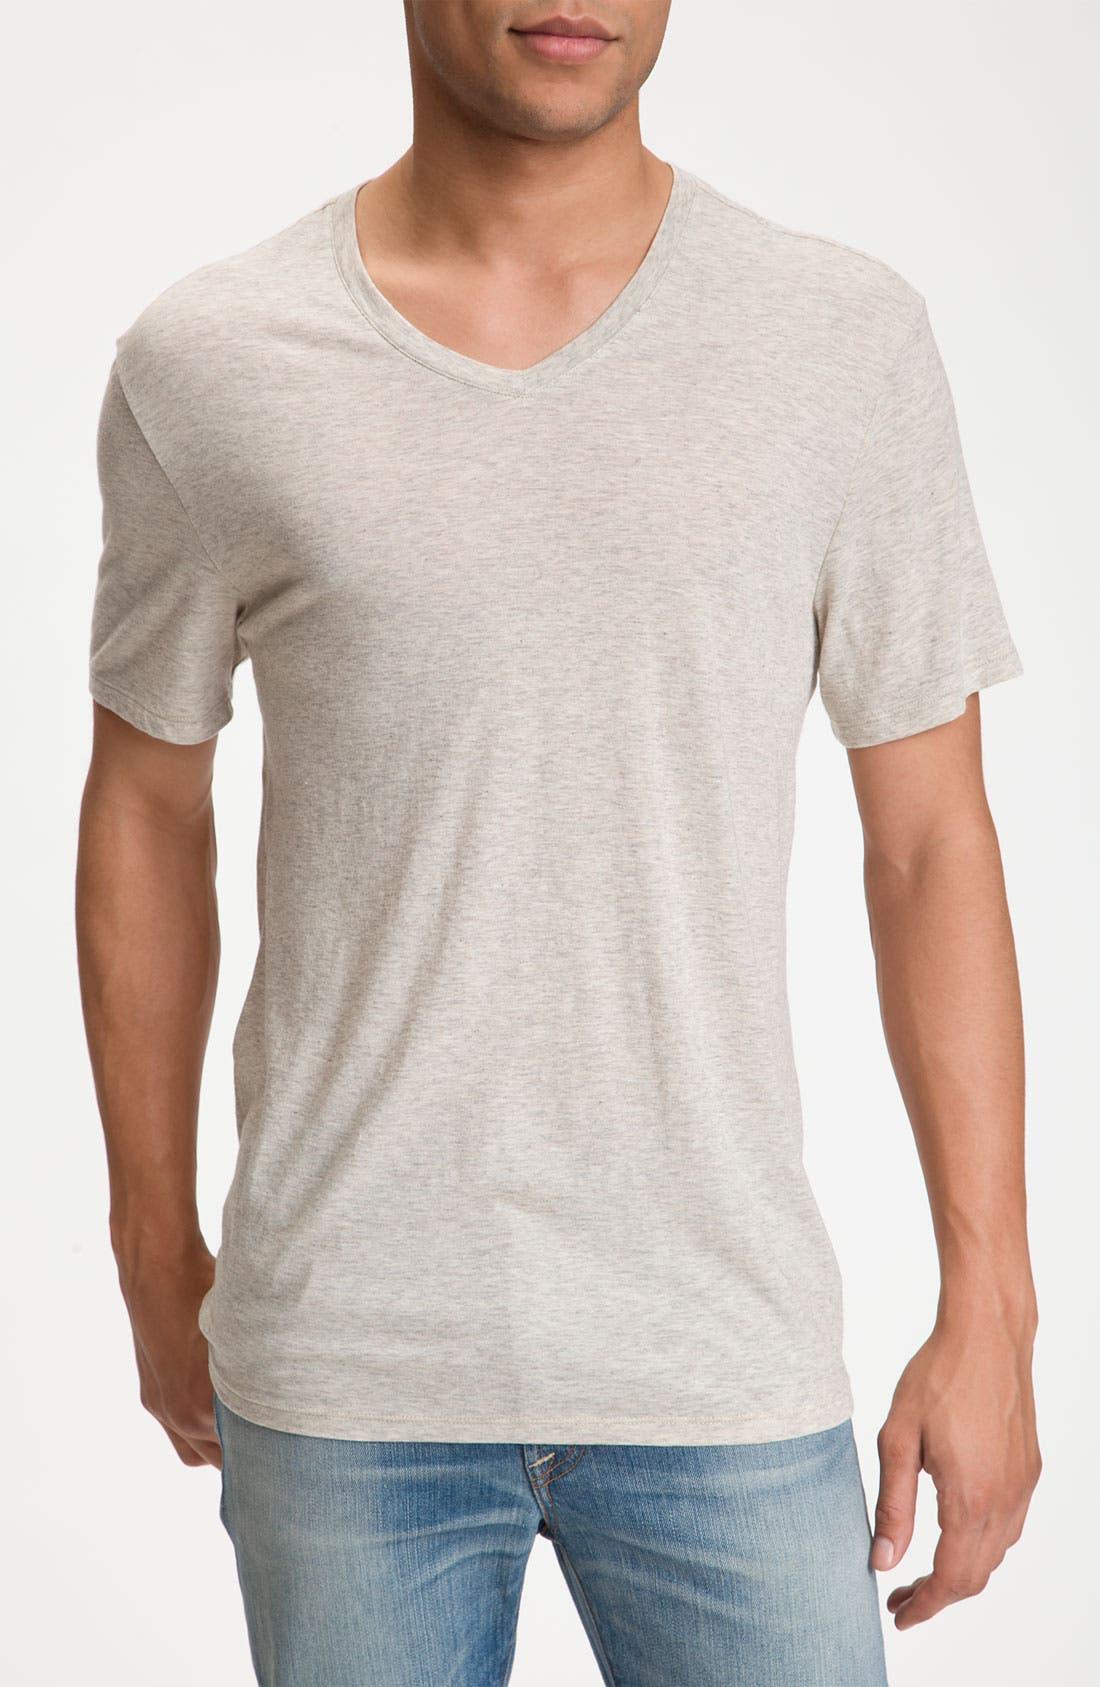 Main Image - Vince Short Sleeve V-Neck T-Shirt